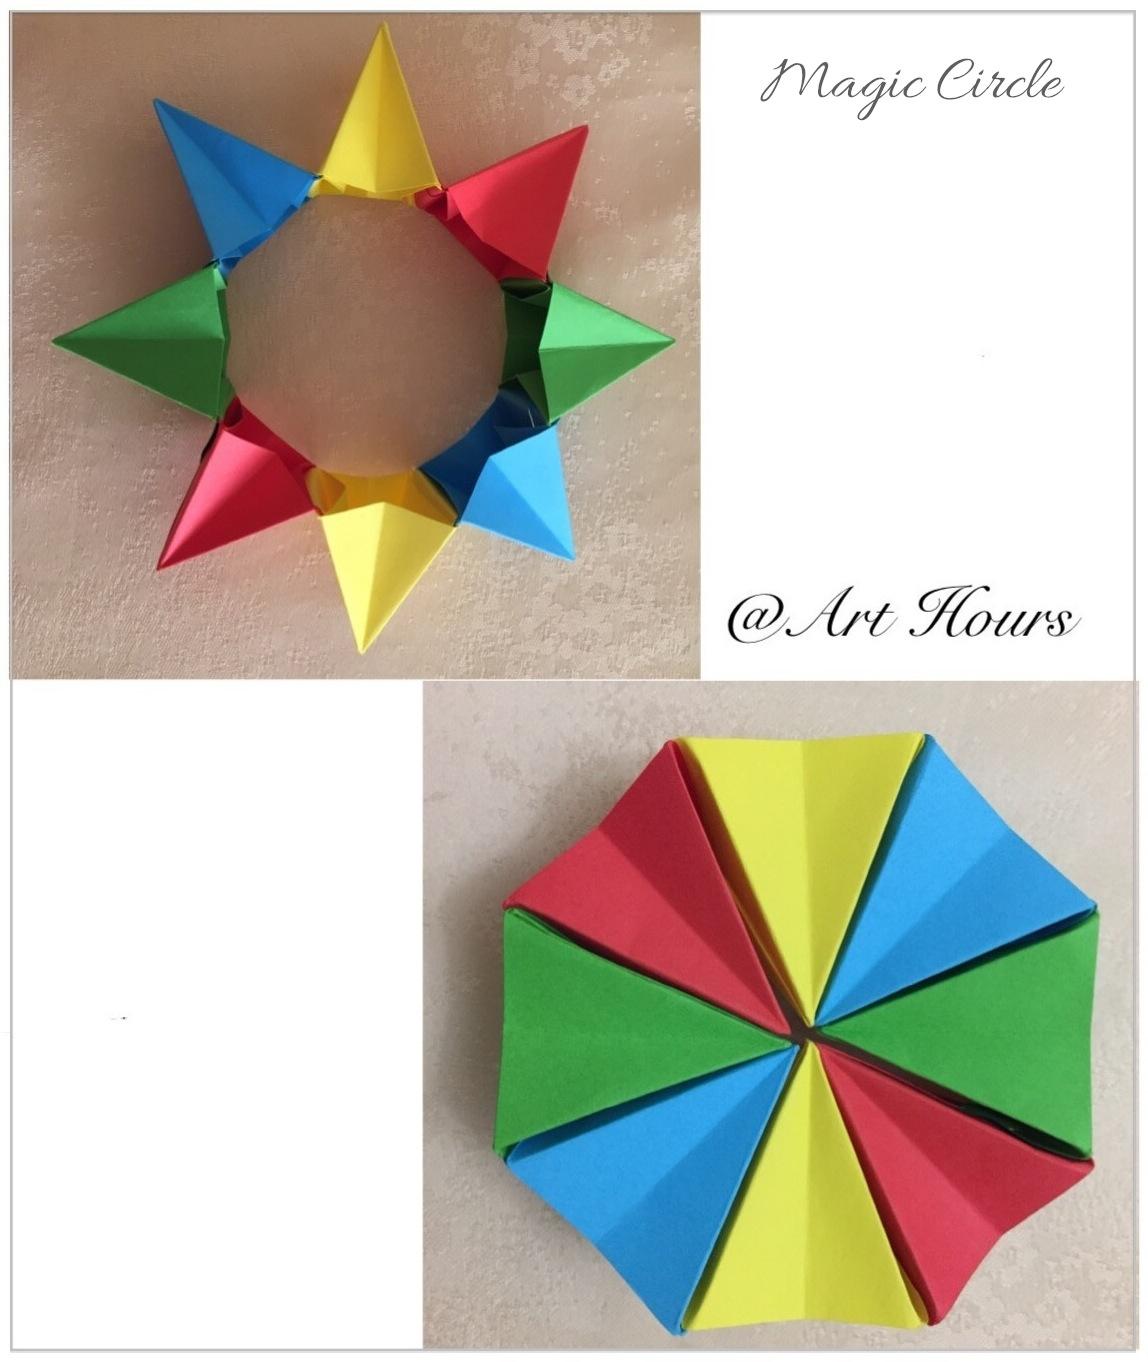 Creative YT - 3D Origami Magic Circle Fireworks Paper... | Facebook | 1362x1148